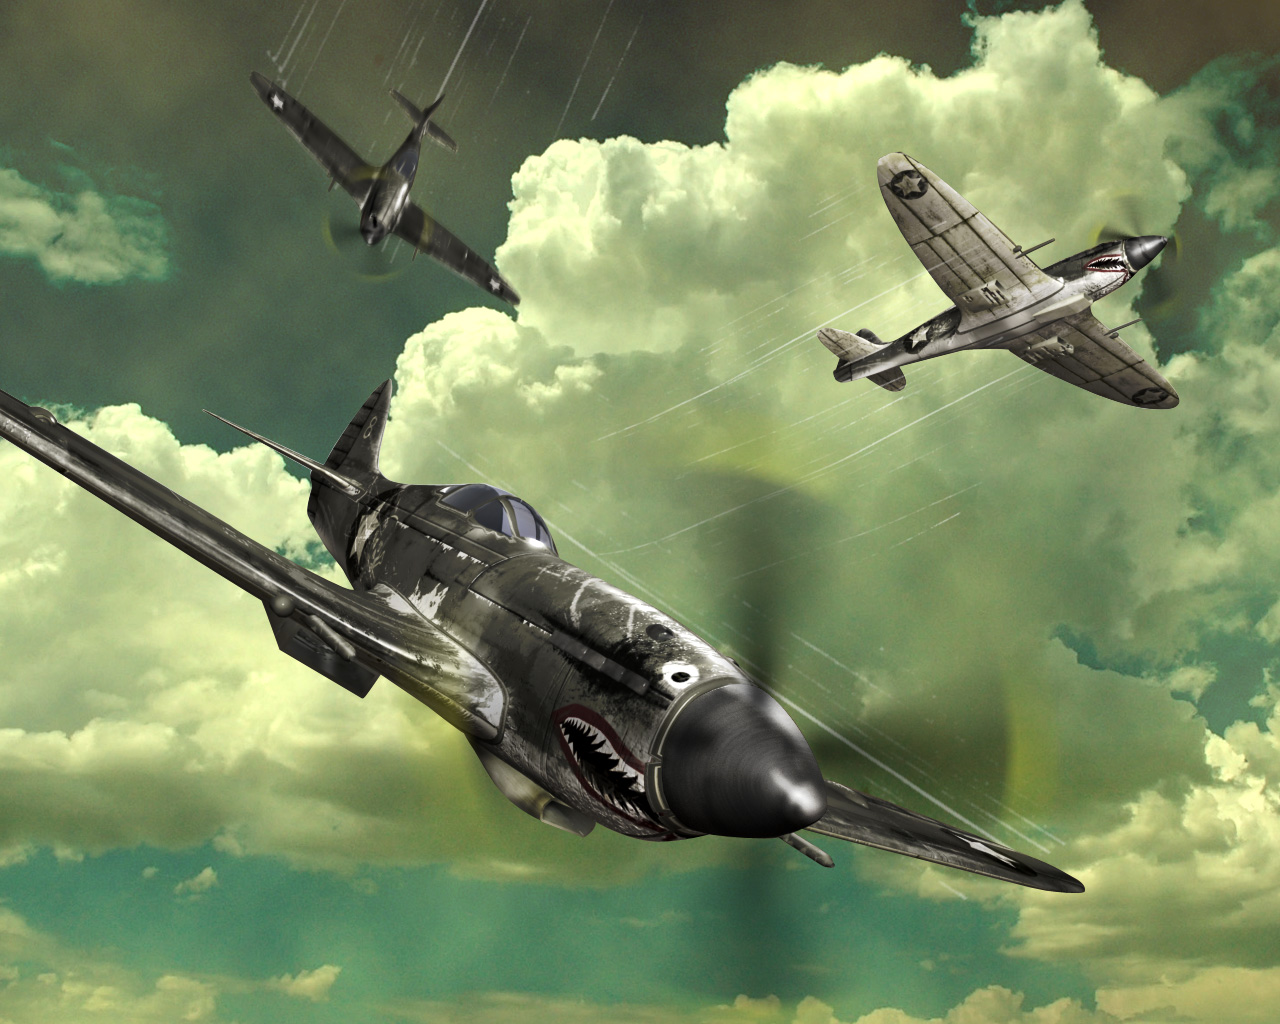 War Plane by phantomx2